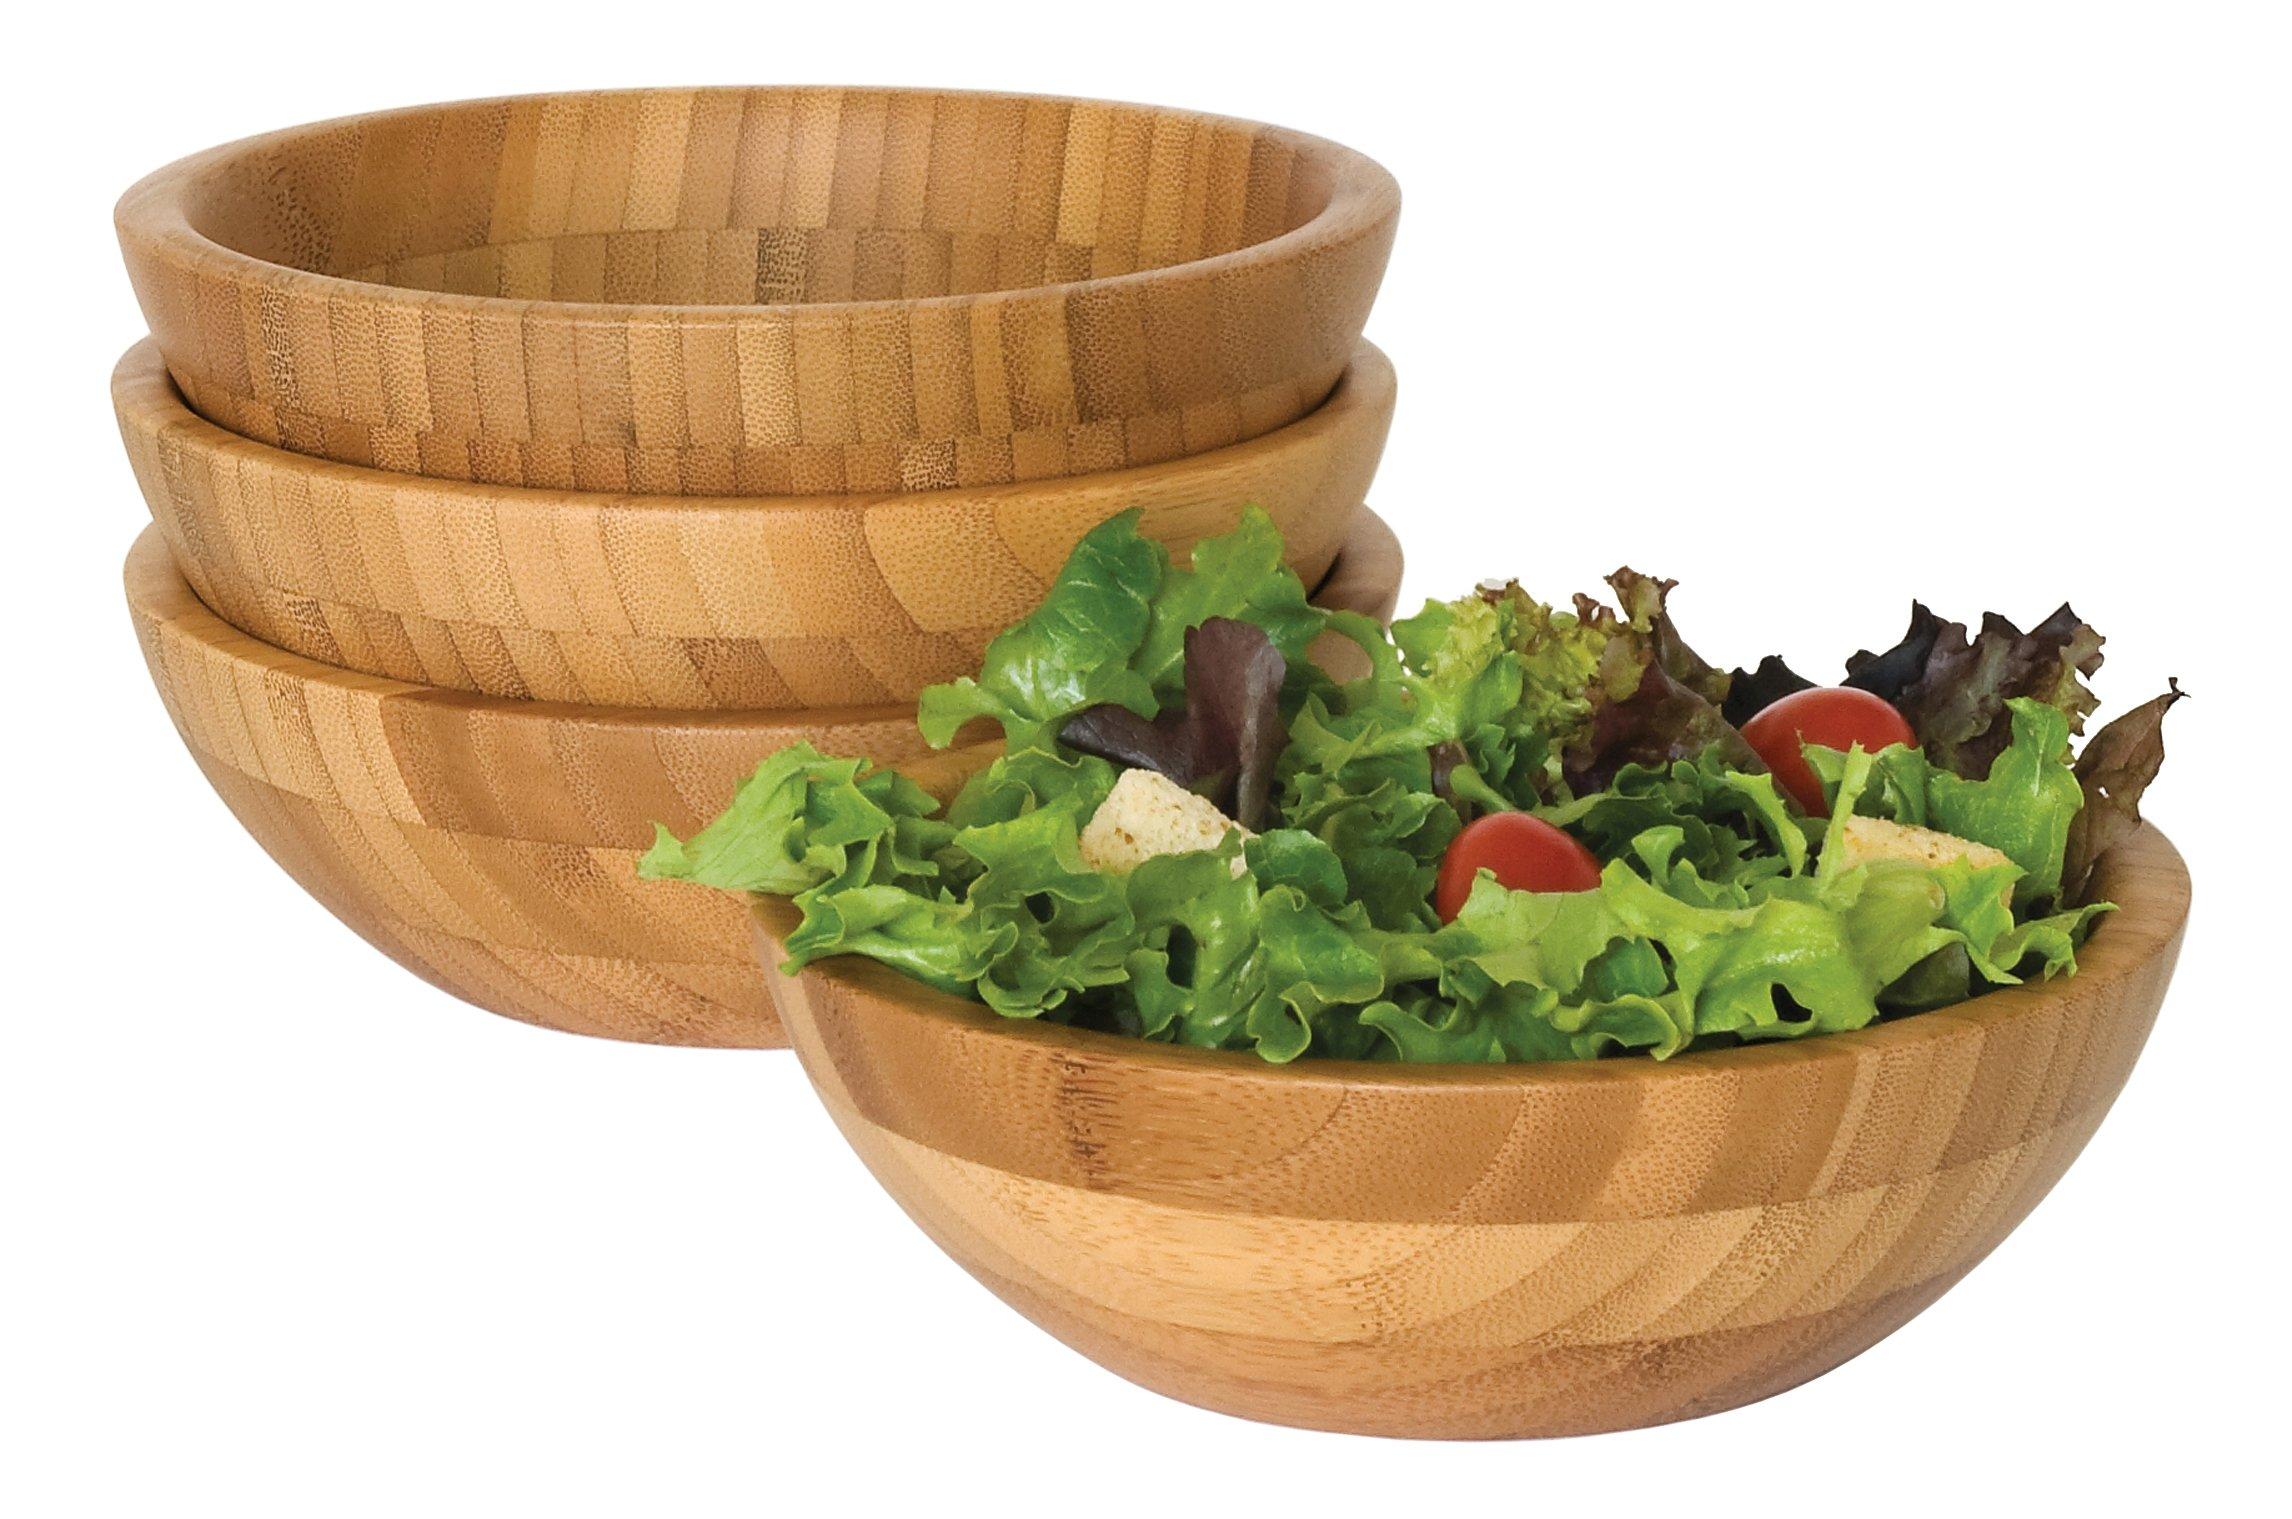 Lipper International 8203-4 Bamboo Wood Salad Bowls, Small, 7'' Diameter x 2.25'' Height, Set of 4 Bowls